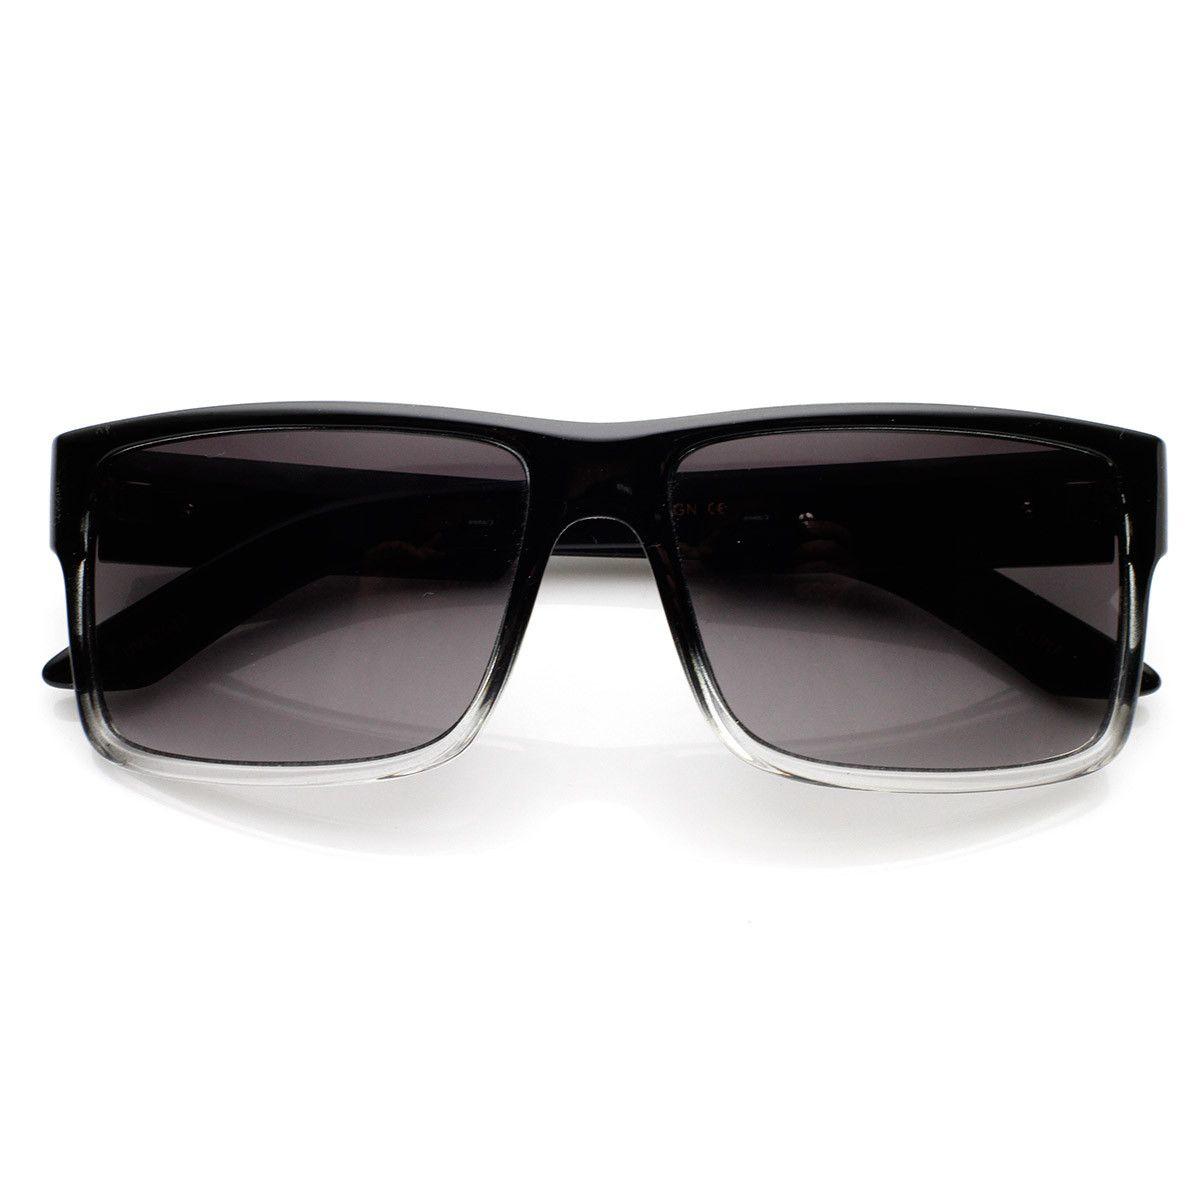 Premium Quality Square Flat Top Action Sports Sunglasses